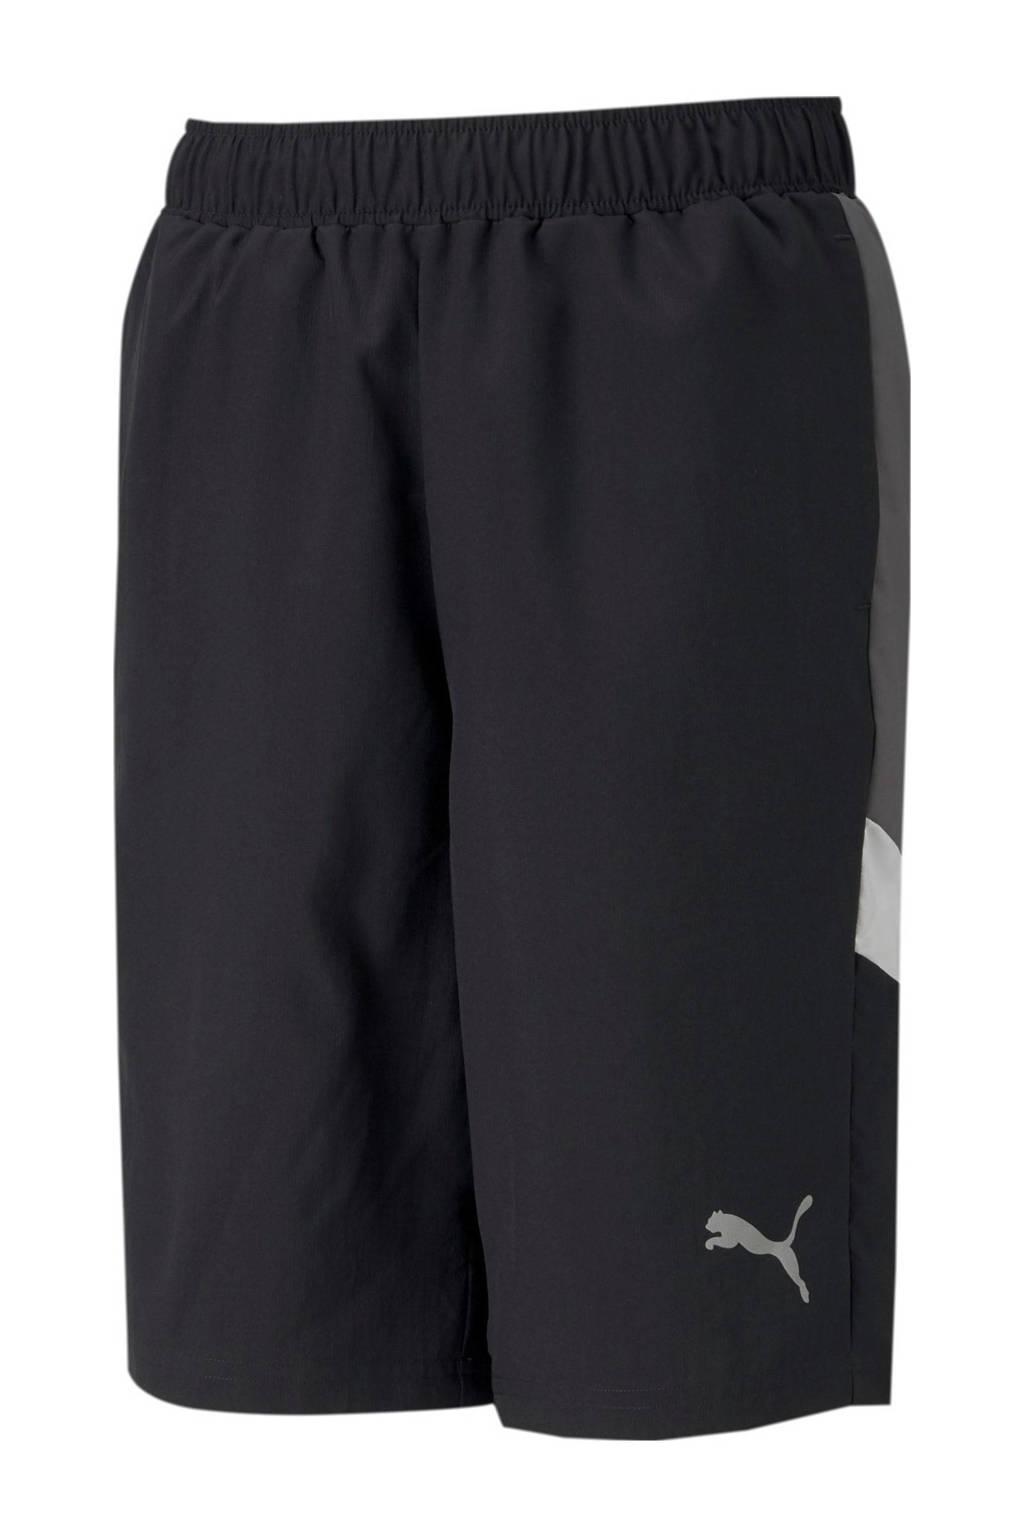 Puma short zwart/wit/grijs, Zwart/wit/grijs